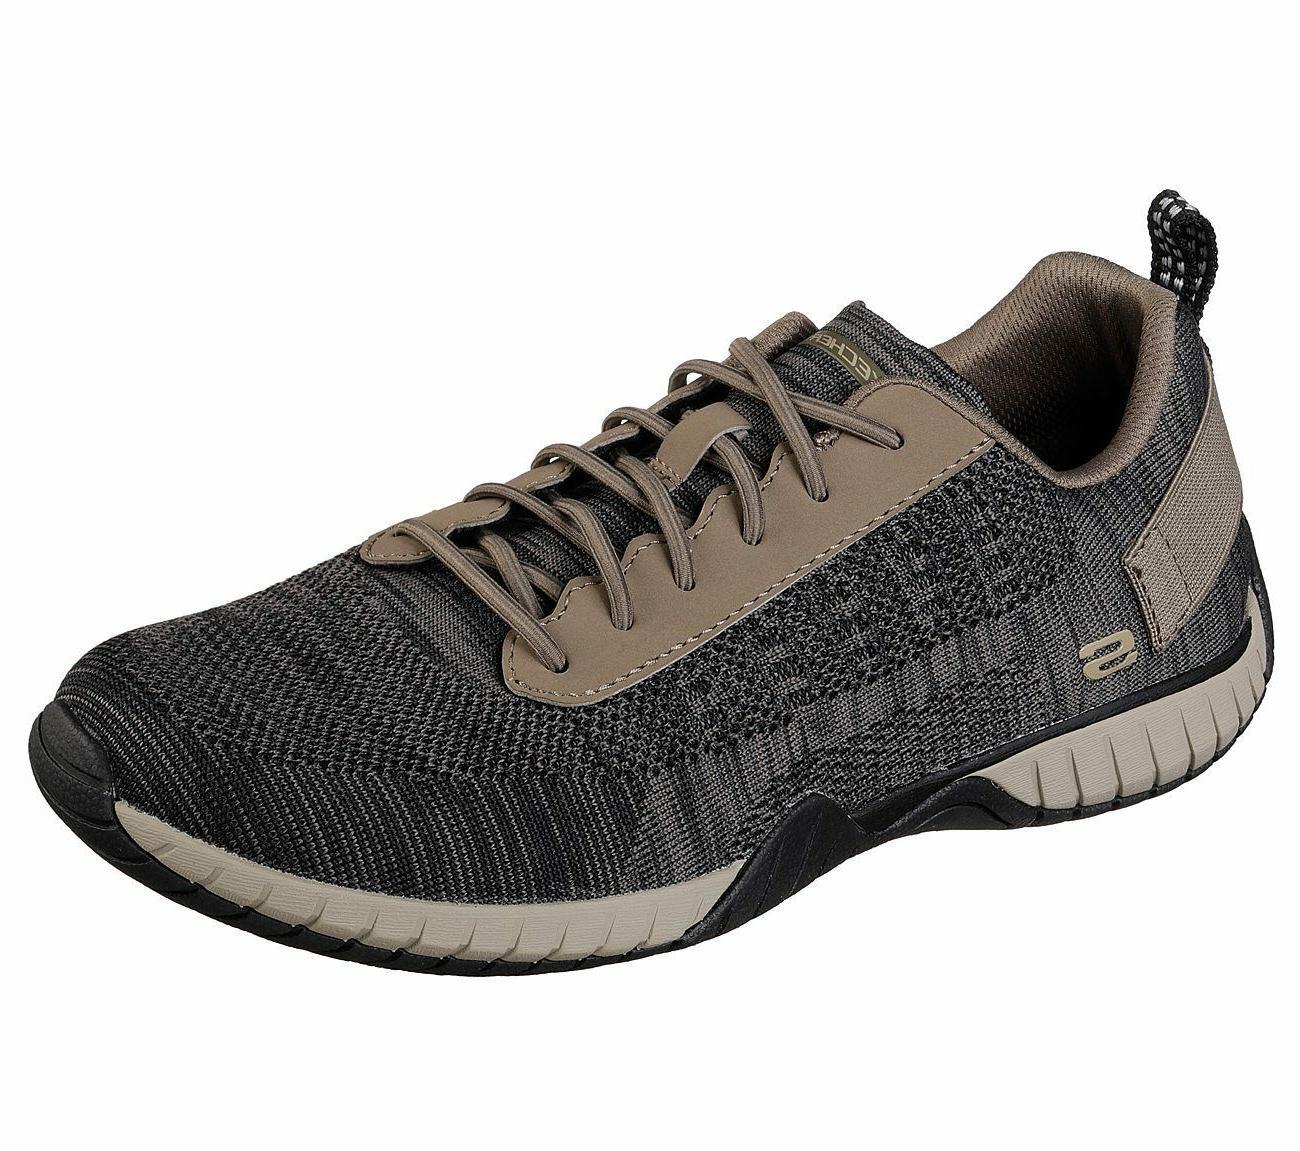 65182 khaki shoe men memory foam casual